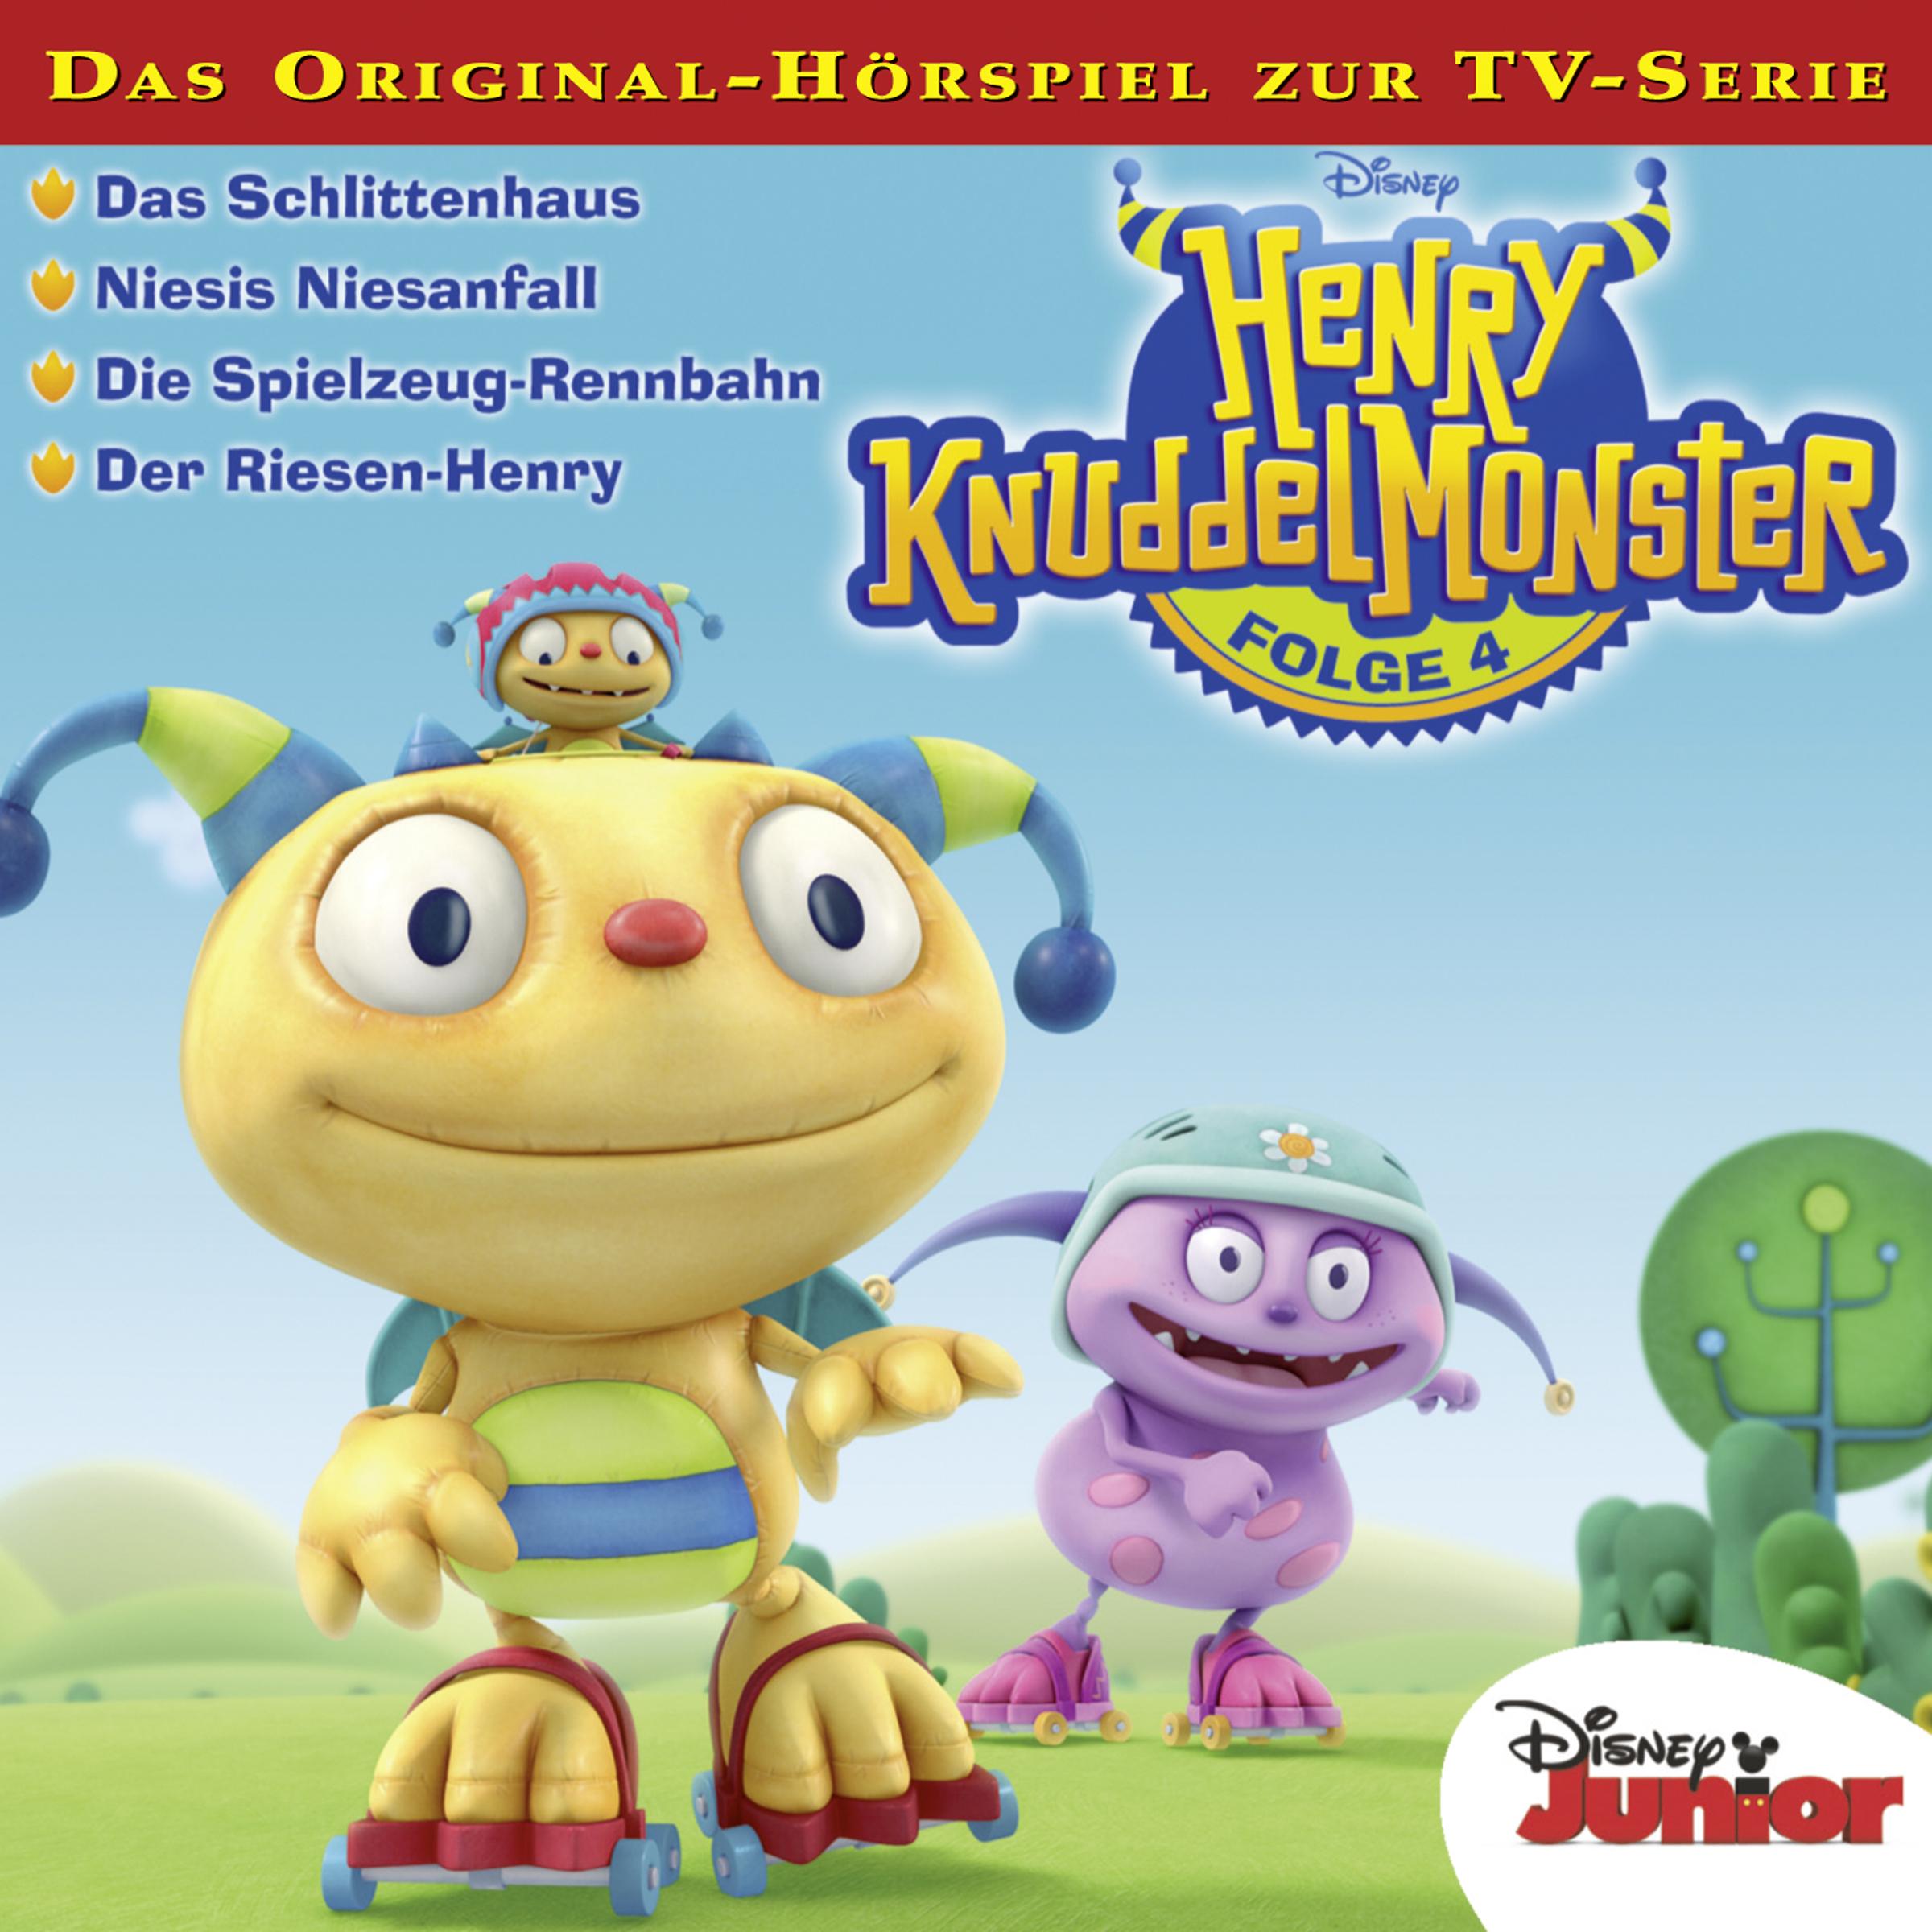 Disney: Henry Knuddelmonster (Folge 4) MP3-Download